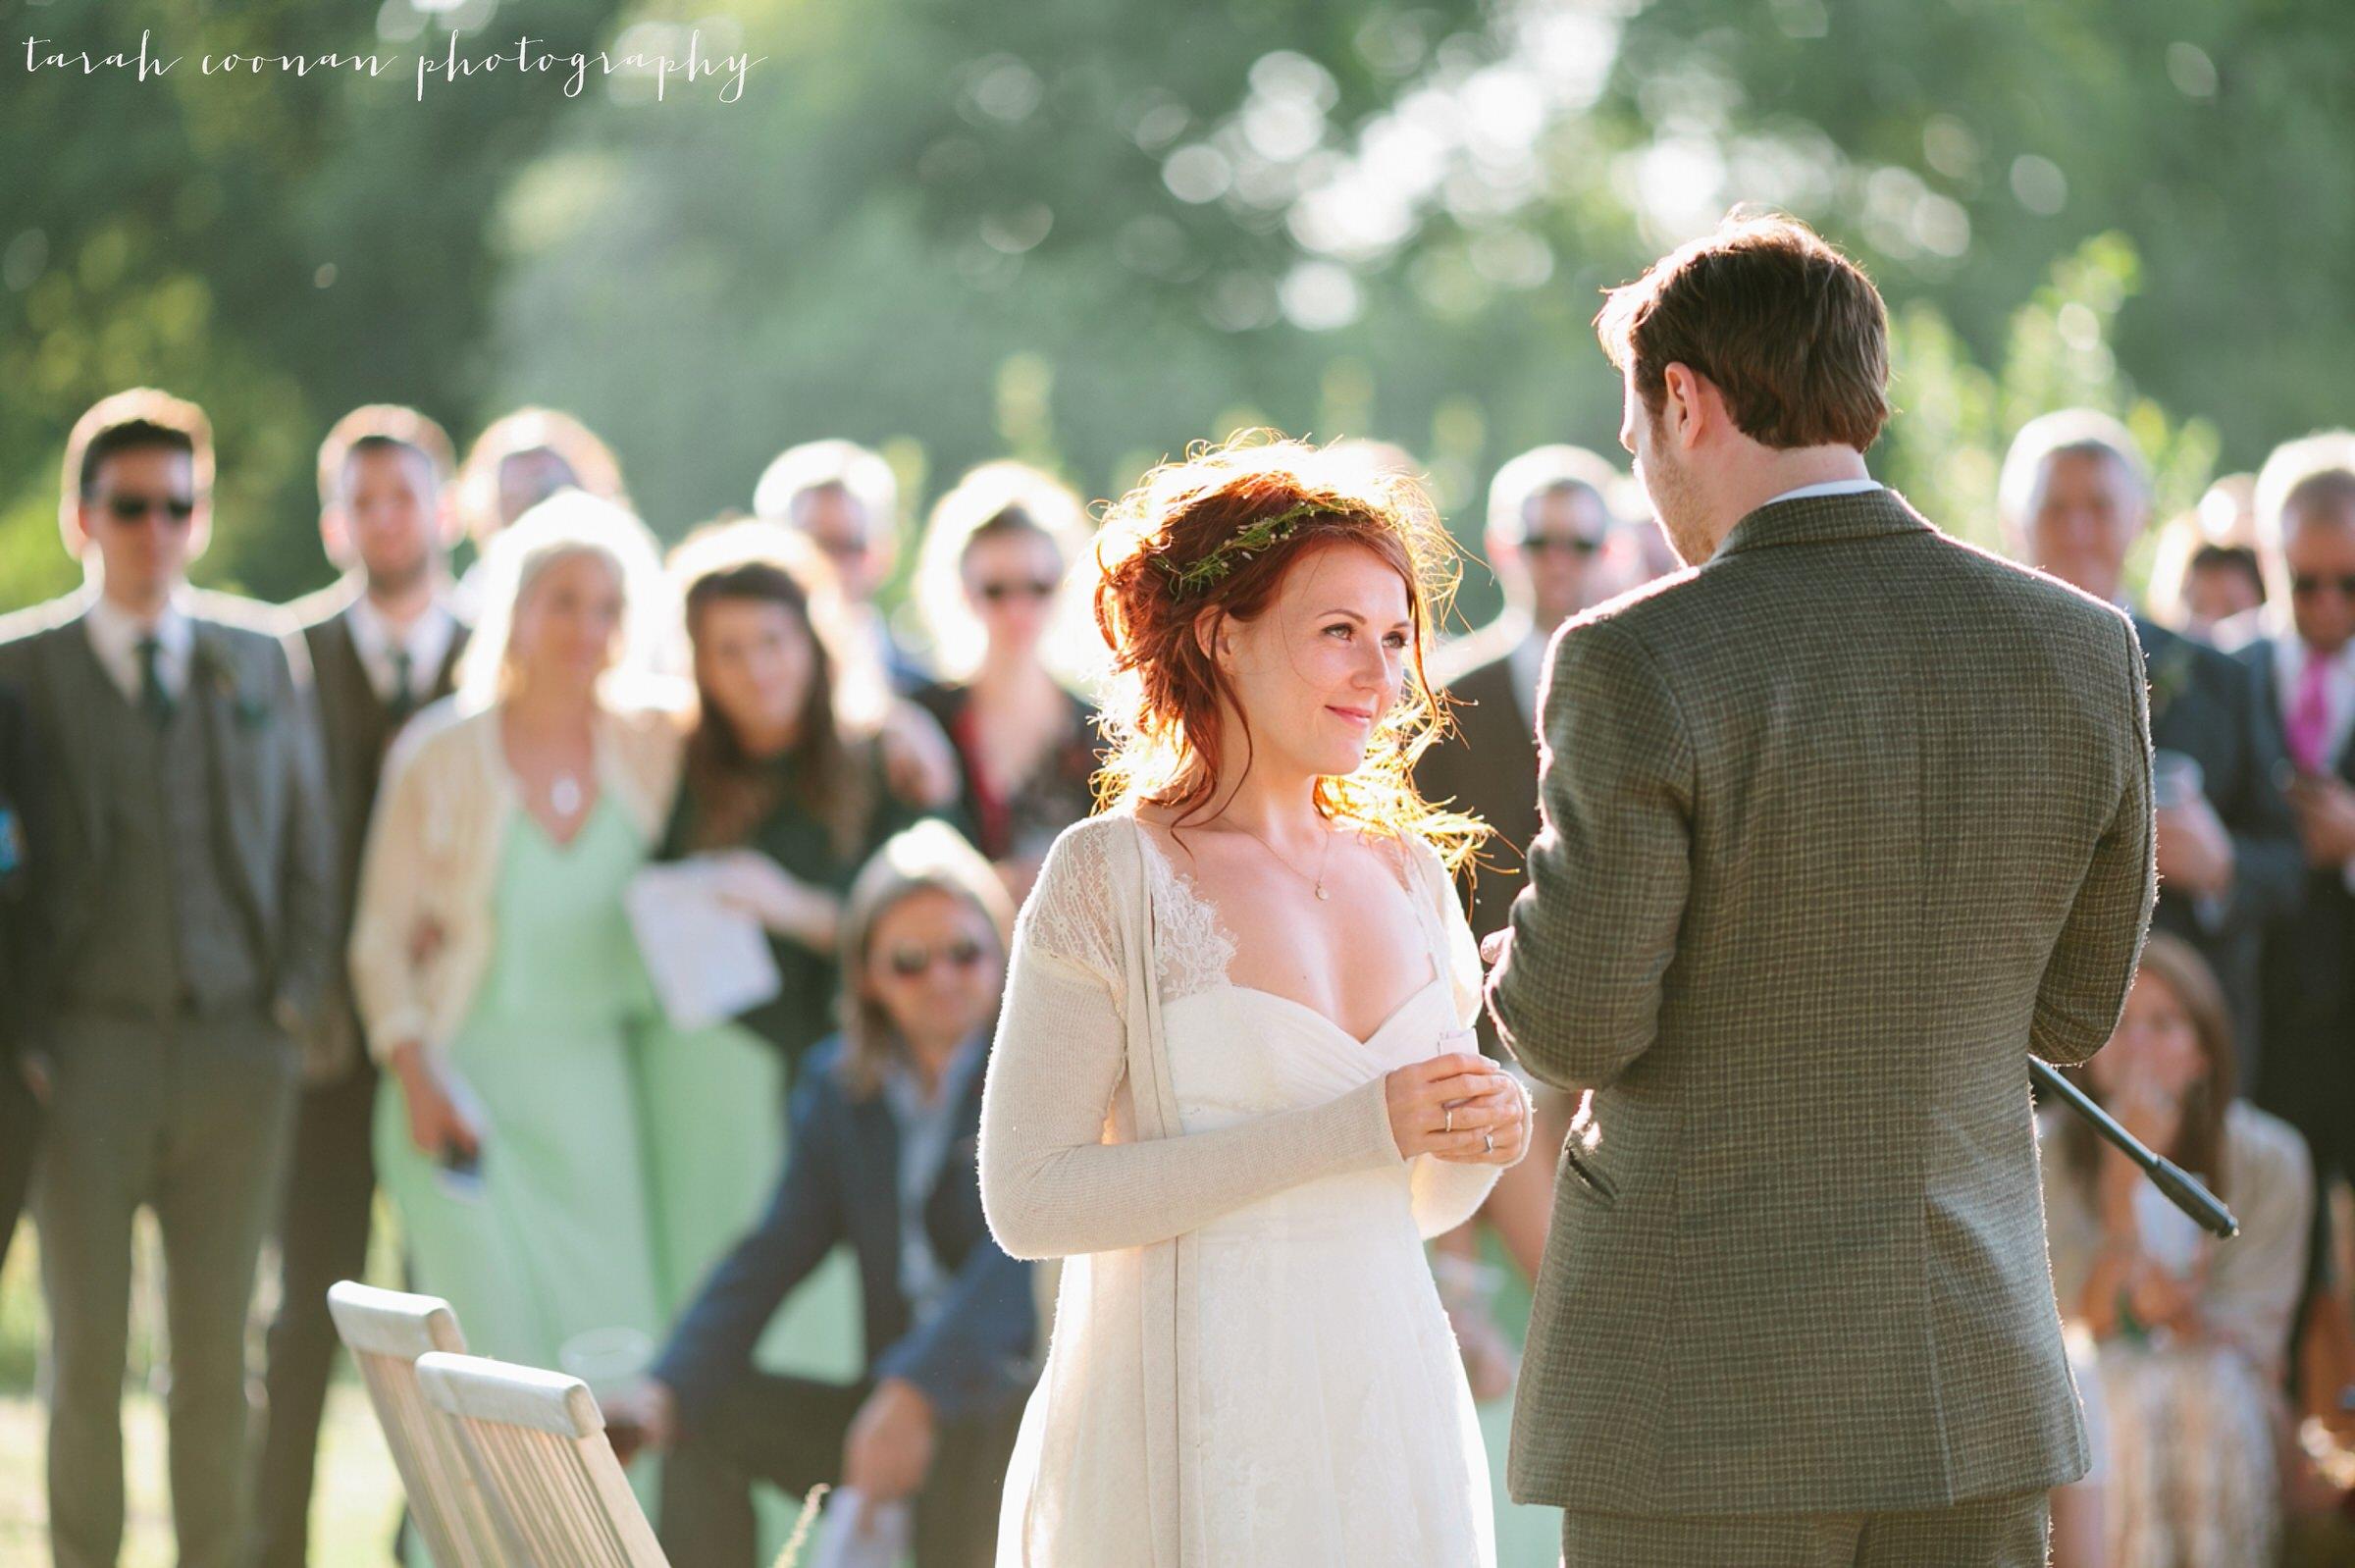 brighton-wedding-photographer24